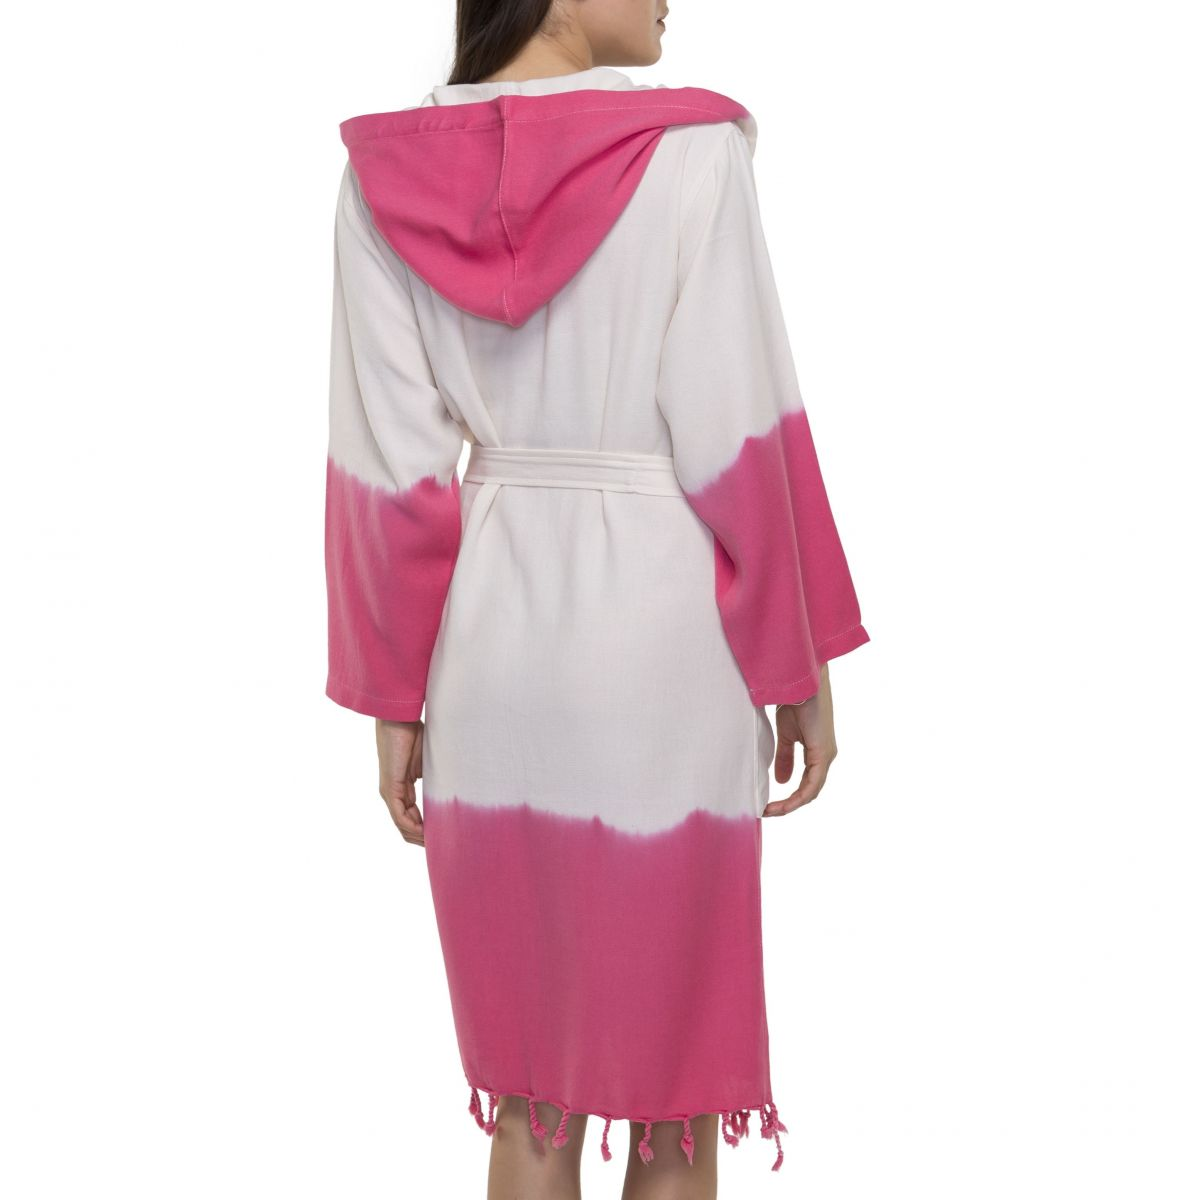 Bathrobe Tie Dye with Hood - Fuchsia